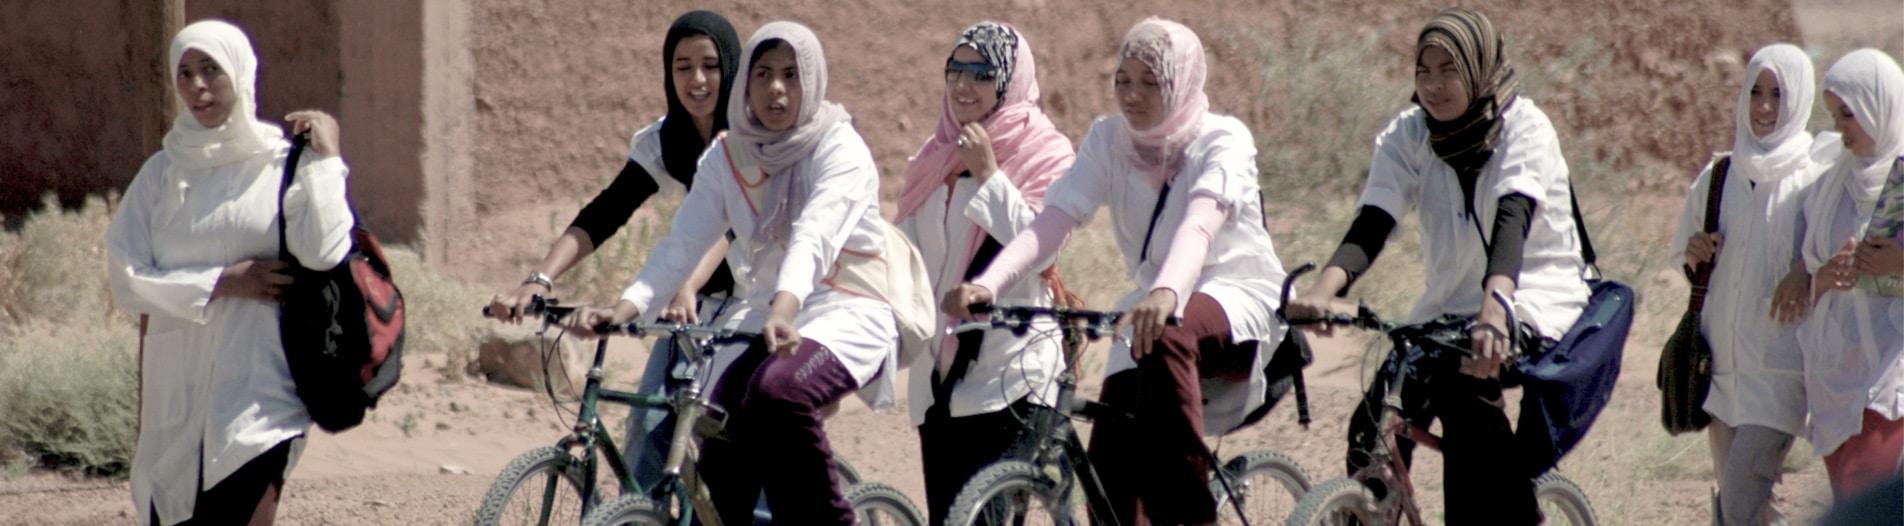 Trekking Morocco senderismo